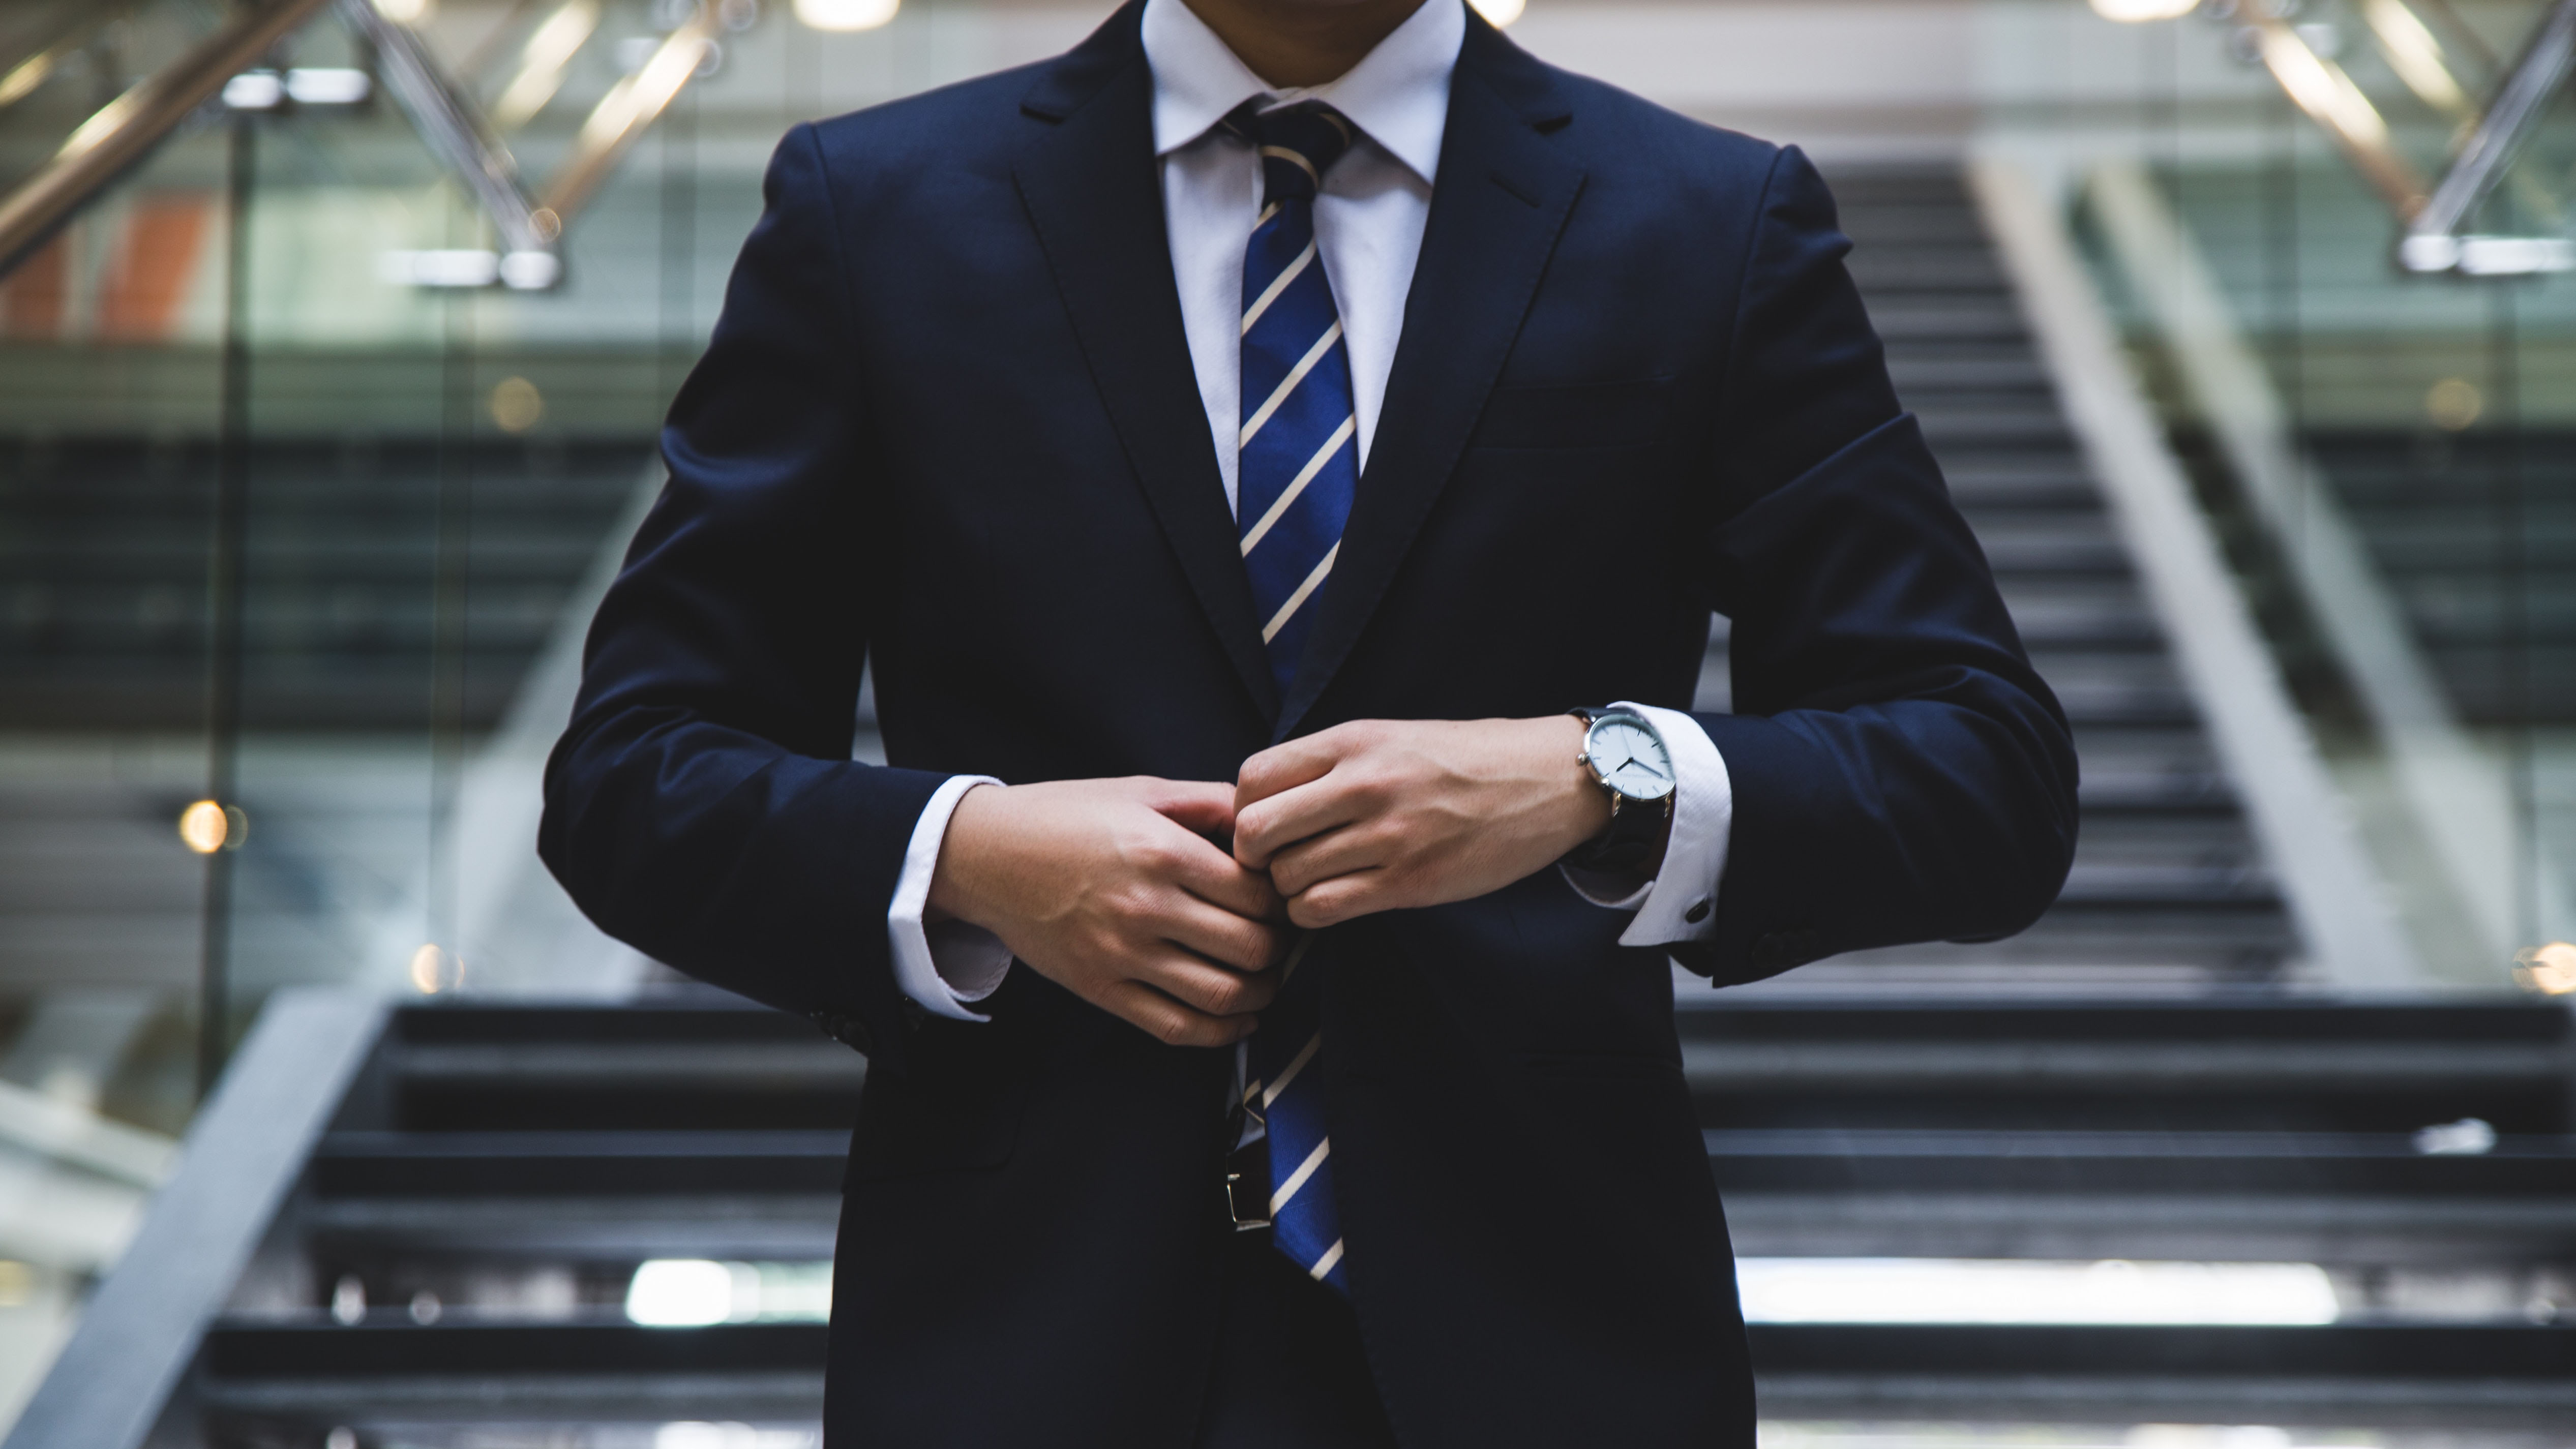 Nonprofit leadership and management